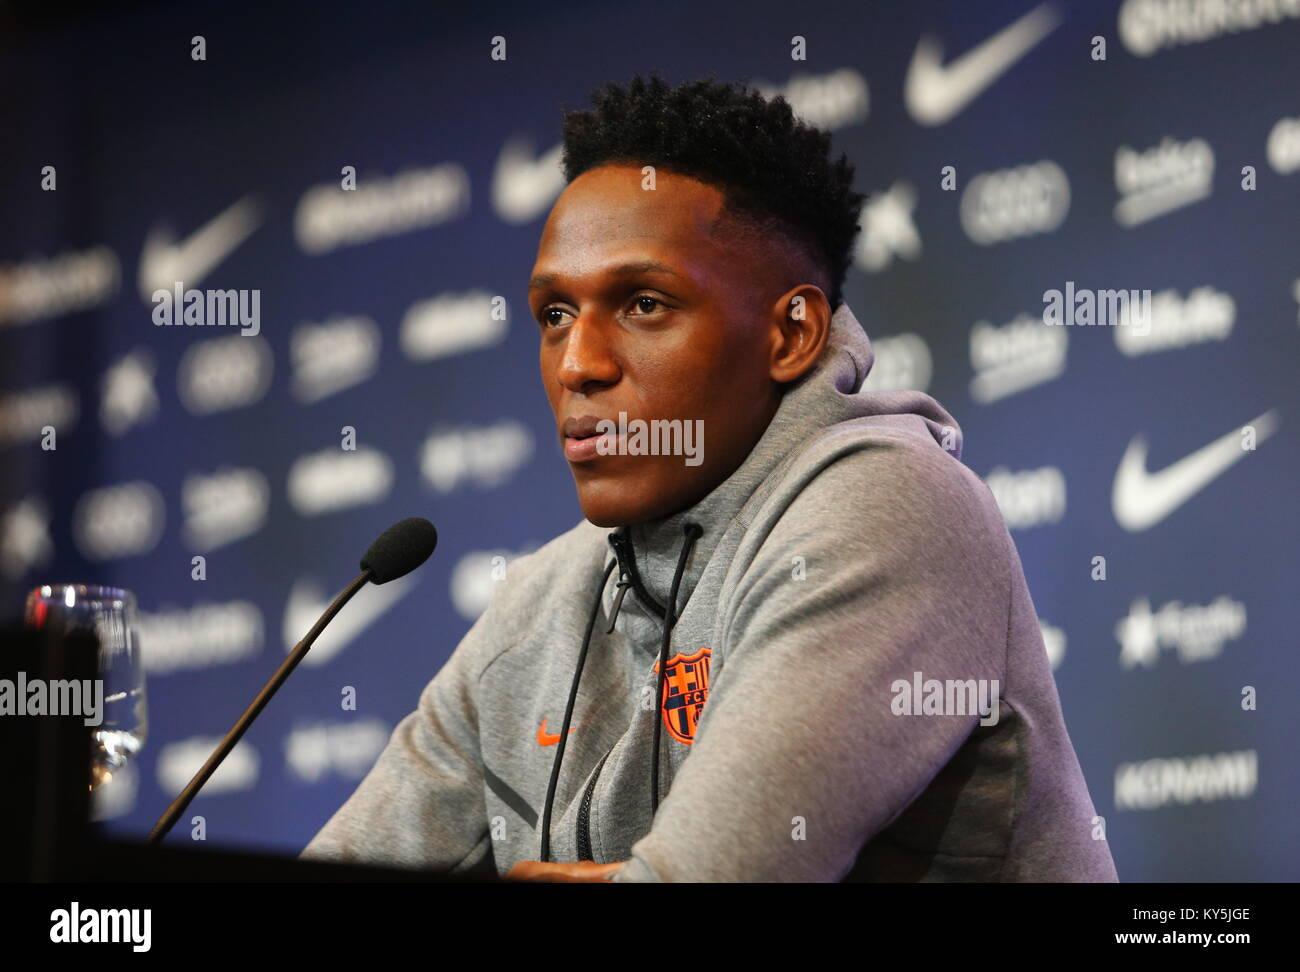 Barcelona, Spain. 13th Jan, 2018. Camp Nou, Barcelona, Spain; New FC Barcelona signing Yerry Mina press conference - Stock Image